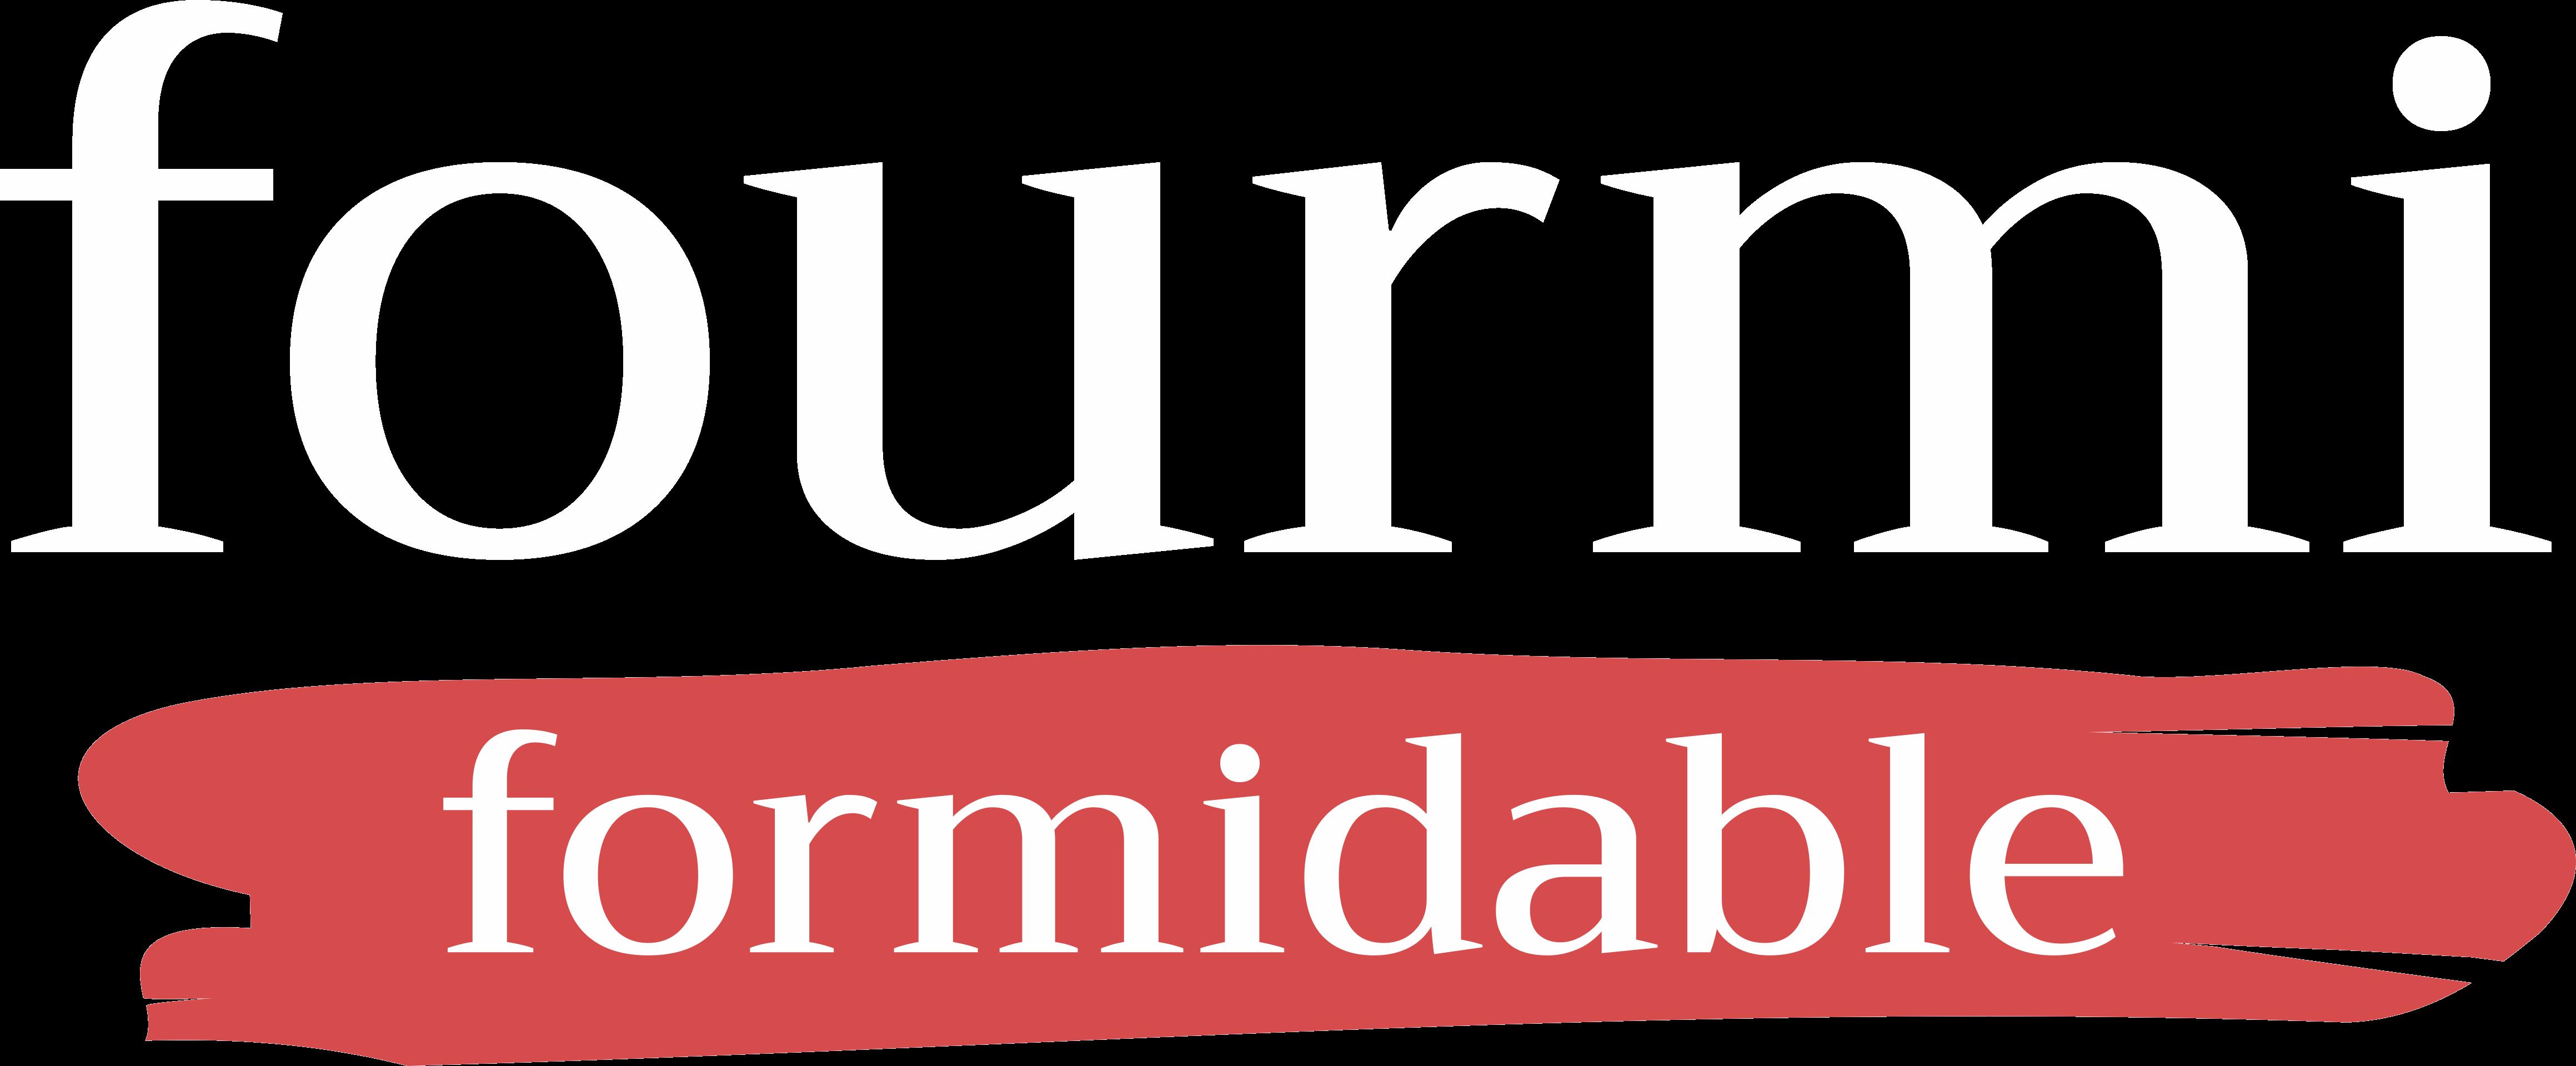 Fourmi Formidable